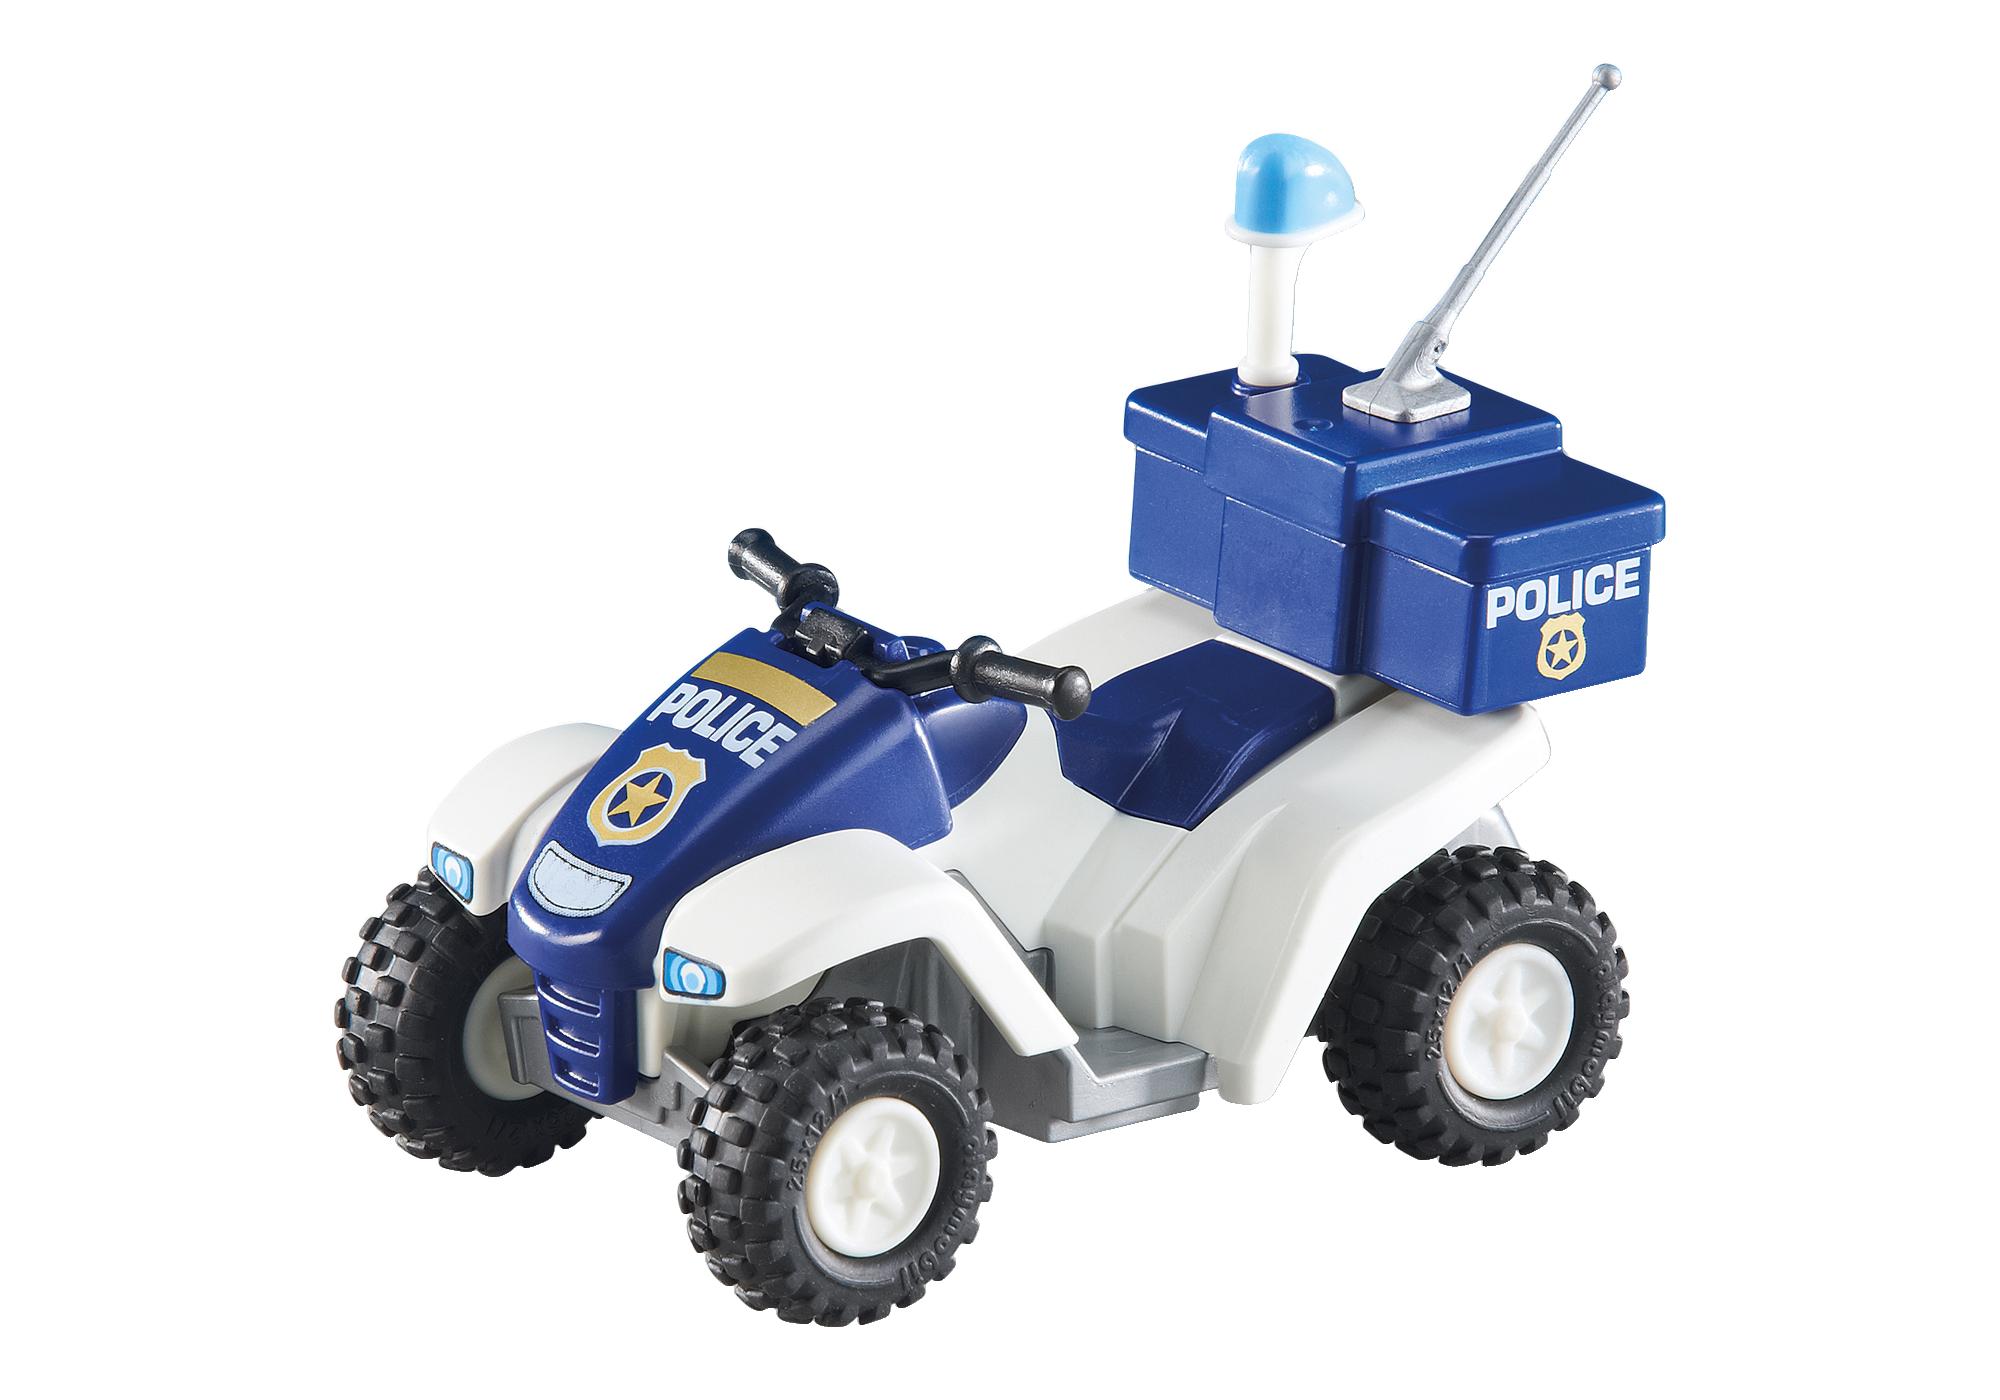 http://media.playmobil.com/i/playmobil/6504_product_detail/Quad policji